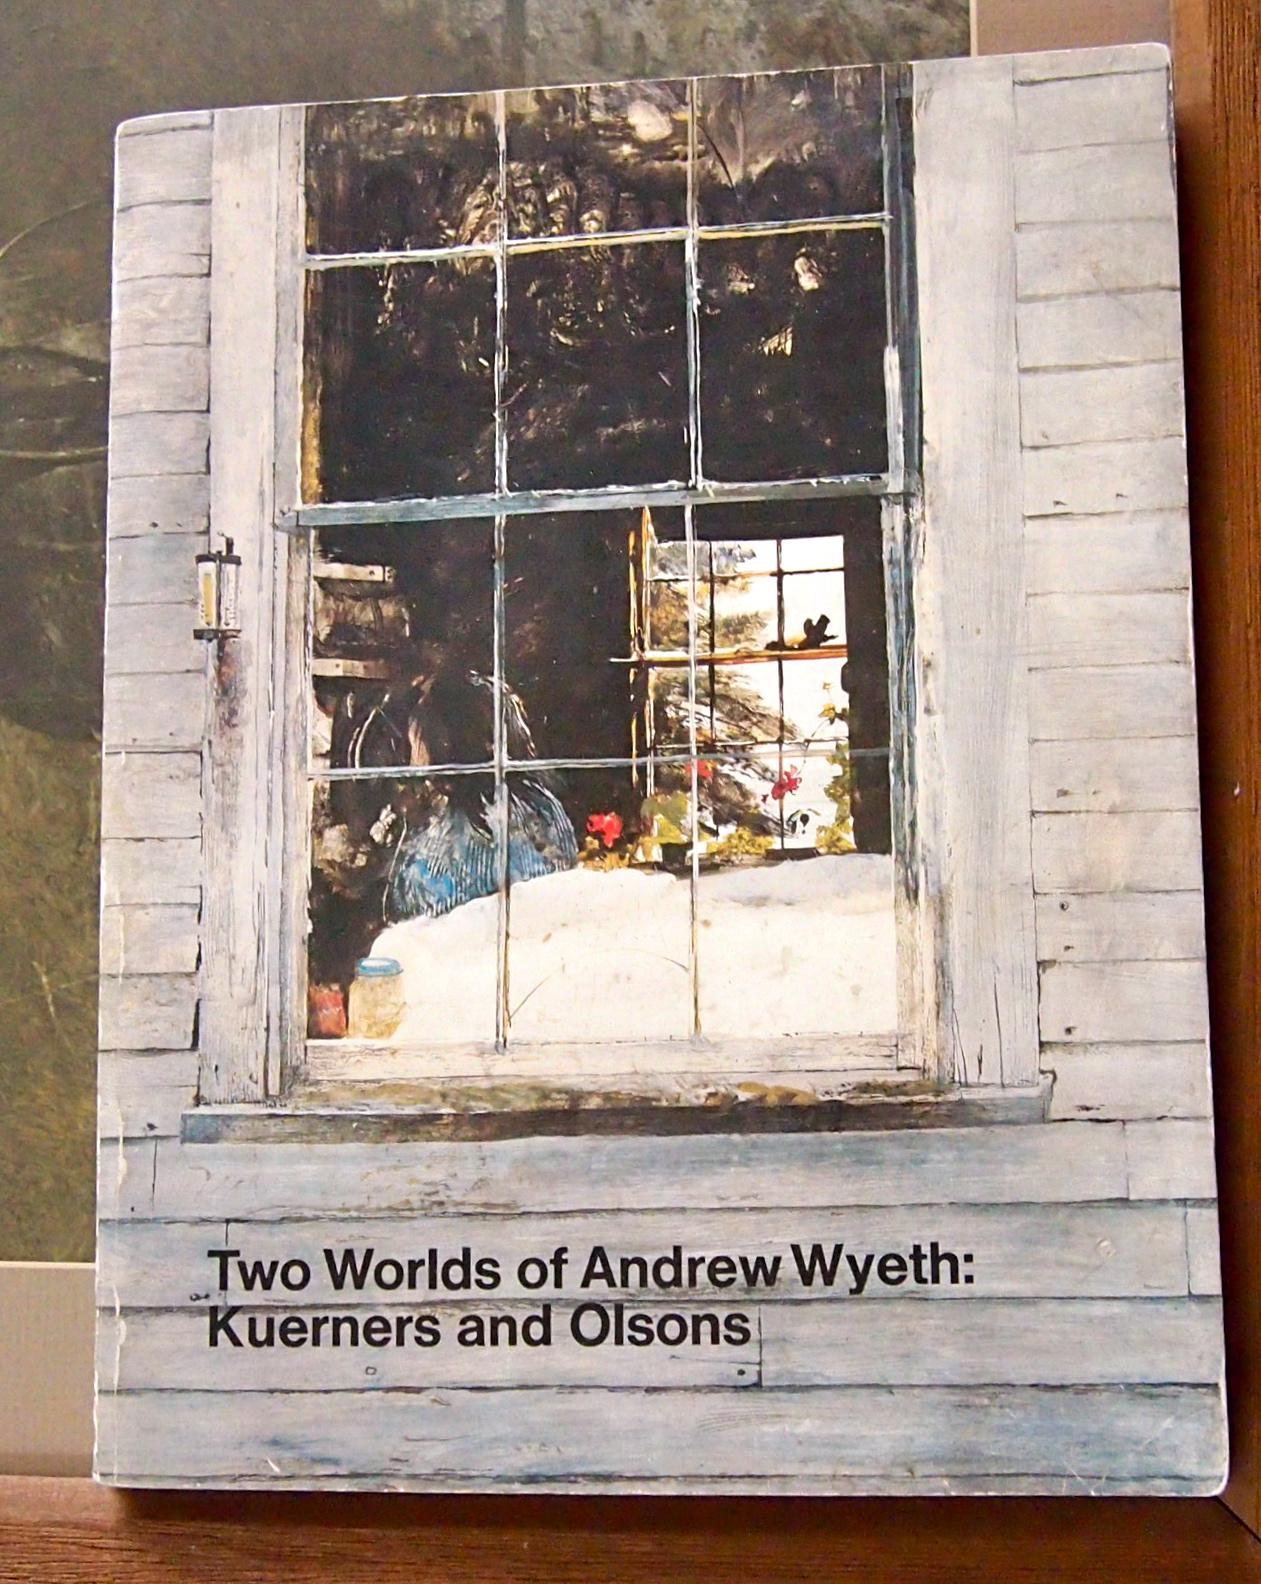 Andrew Wyeth 1976 Metropolitan Museum Of Art Exhibition